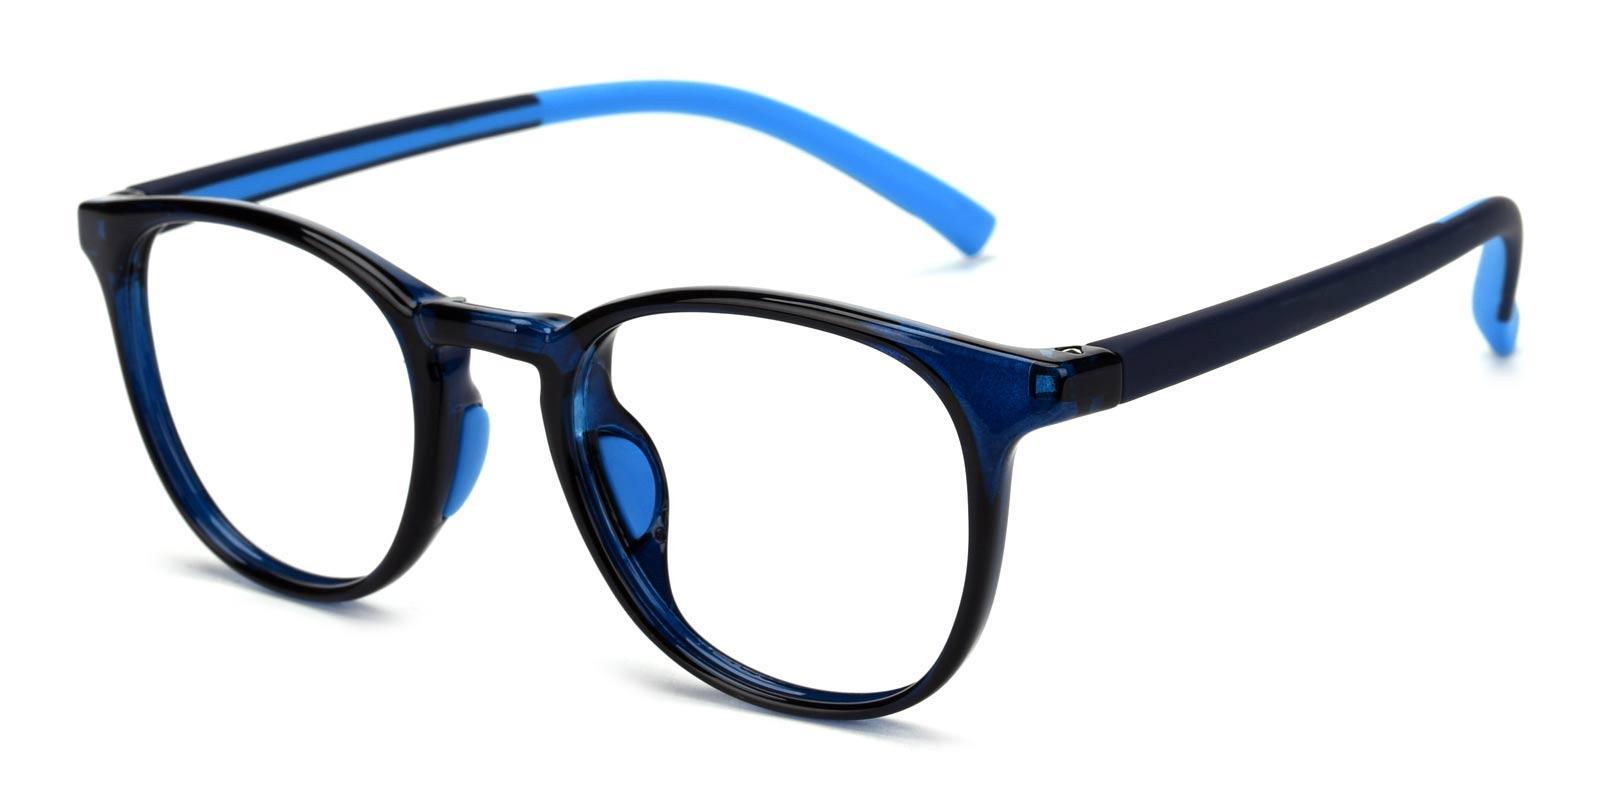 Elvis-Blue-Round-Plastic-Eyeglasses-detail